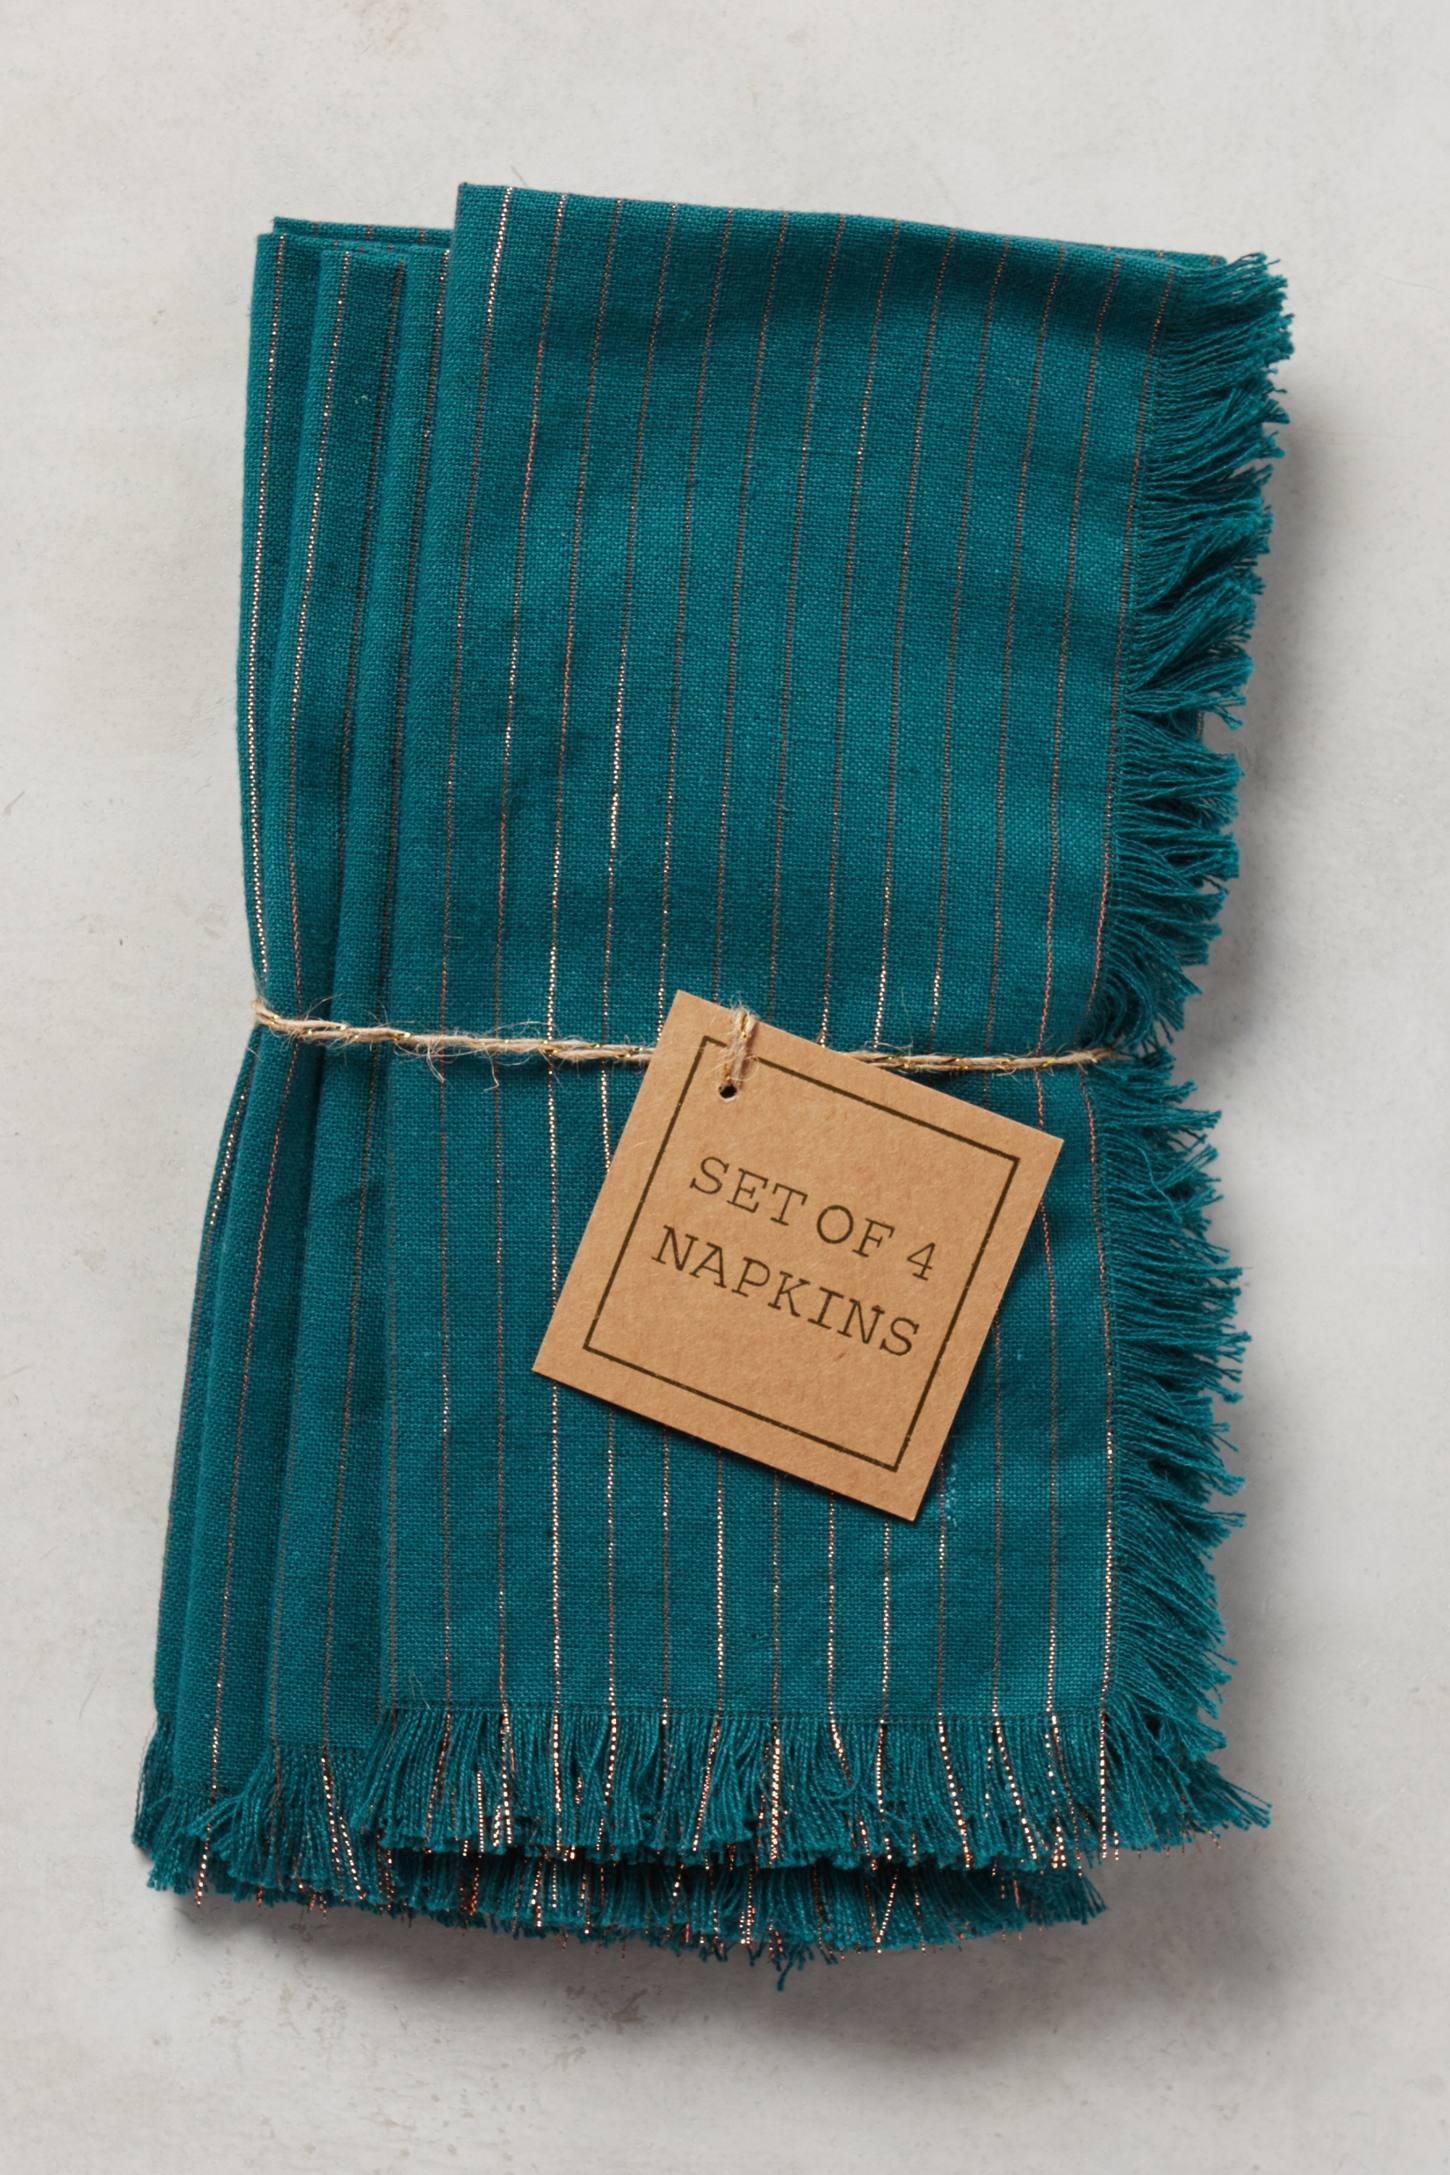 Shimmer Stripe Napkins